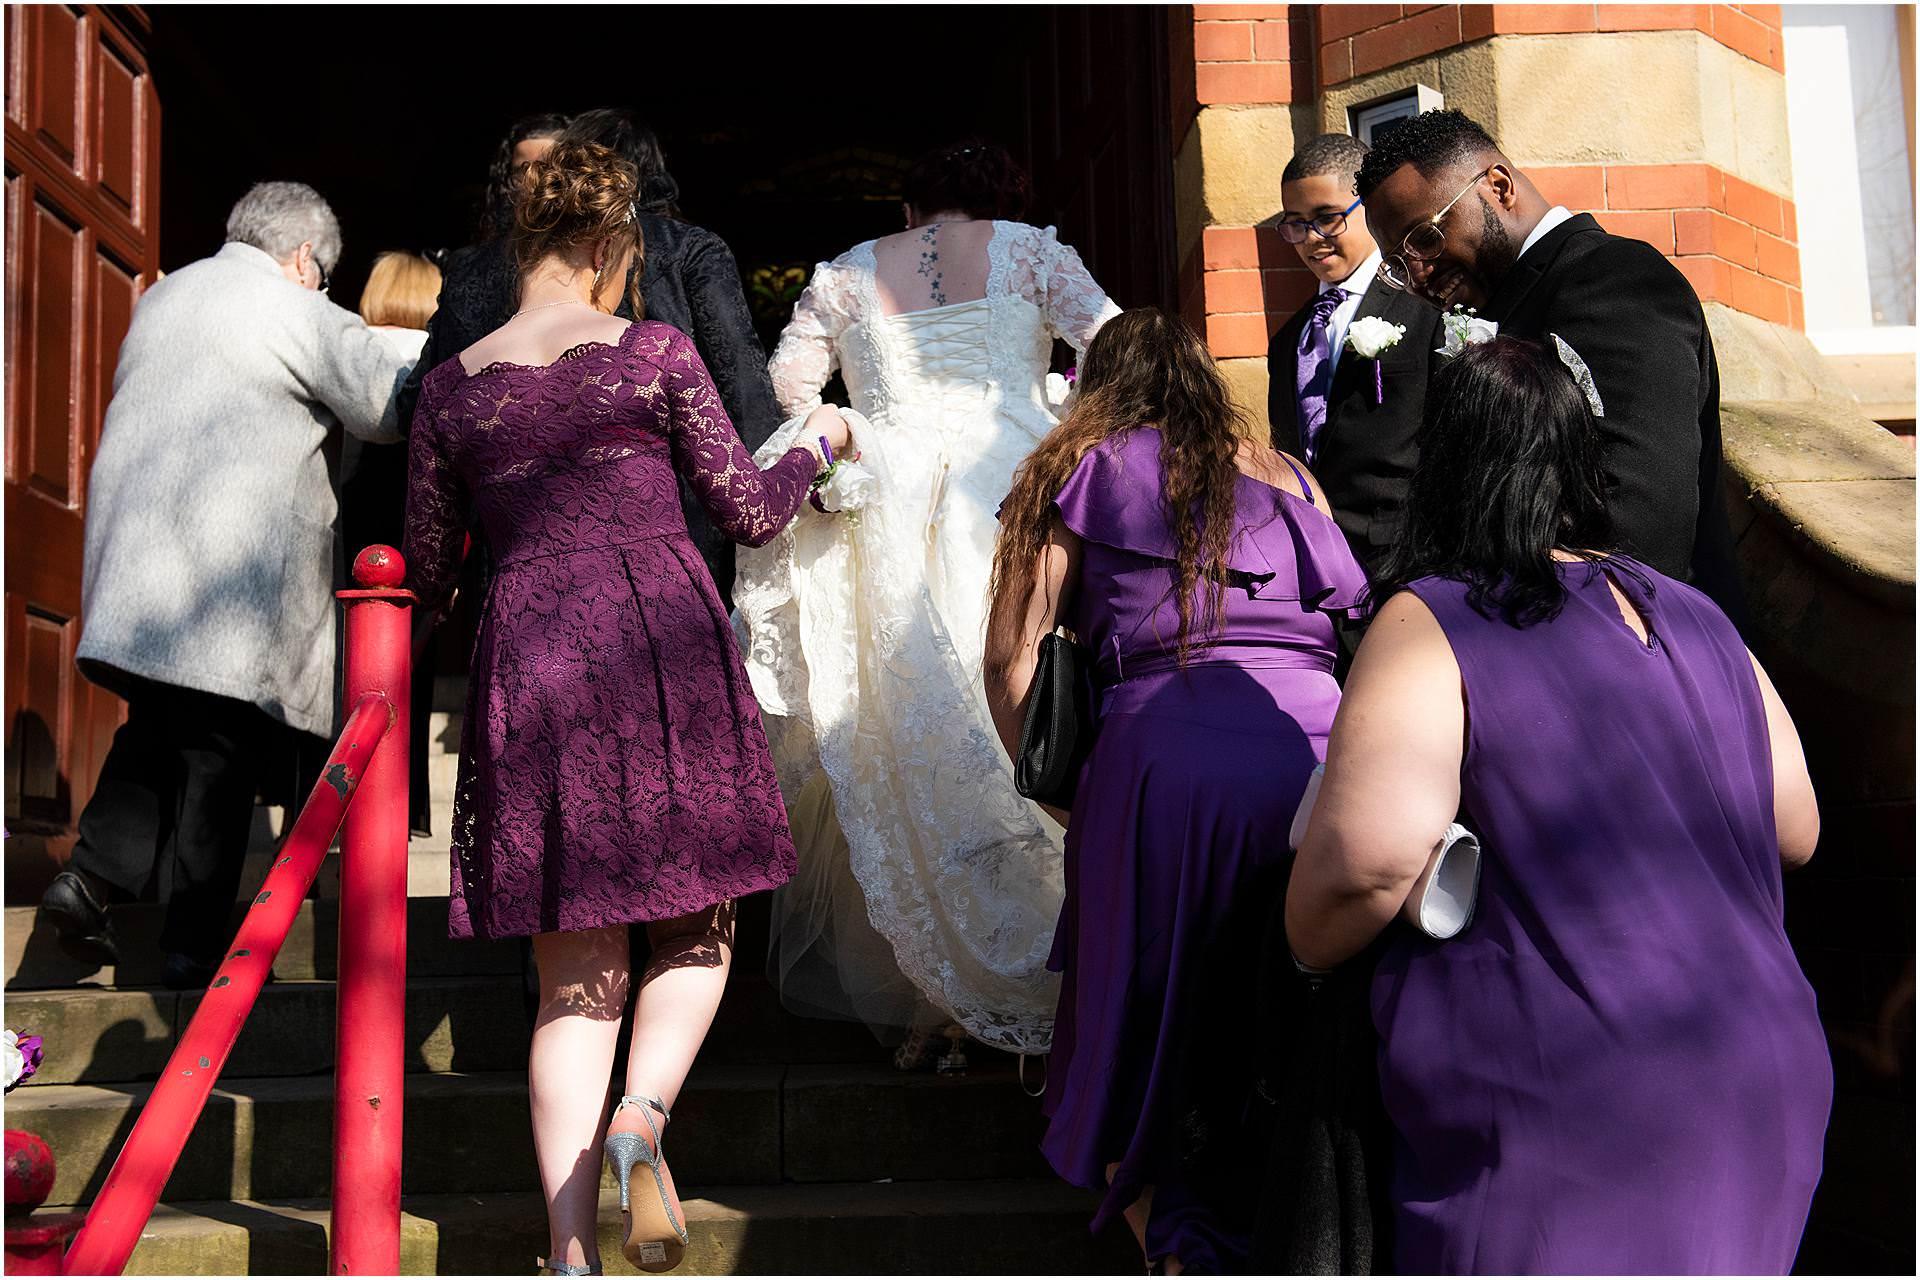 wedding_photography at dukinfield_townhall with sarah_bee_photography dukinfield_park dukinfeild_cheshire_1999.jpg